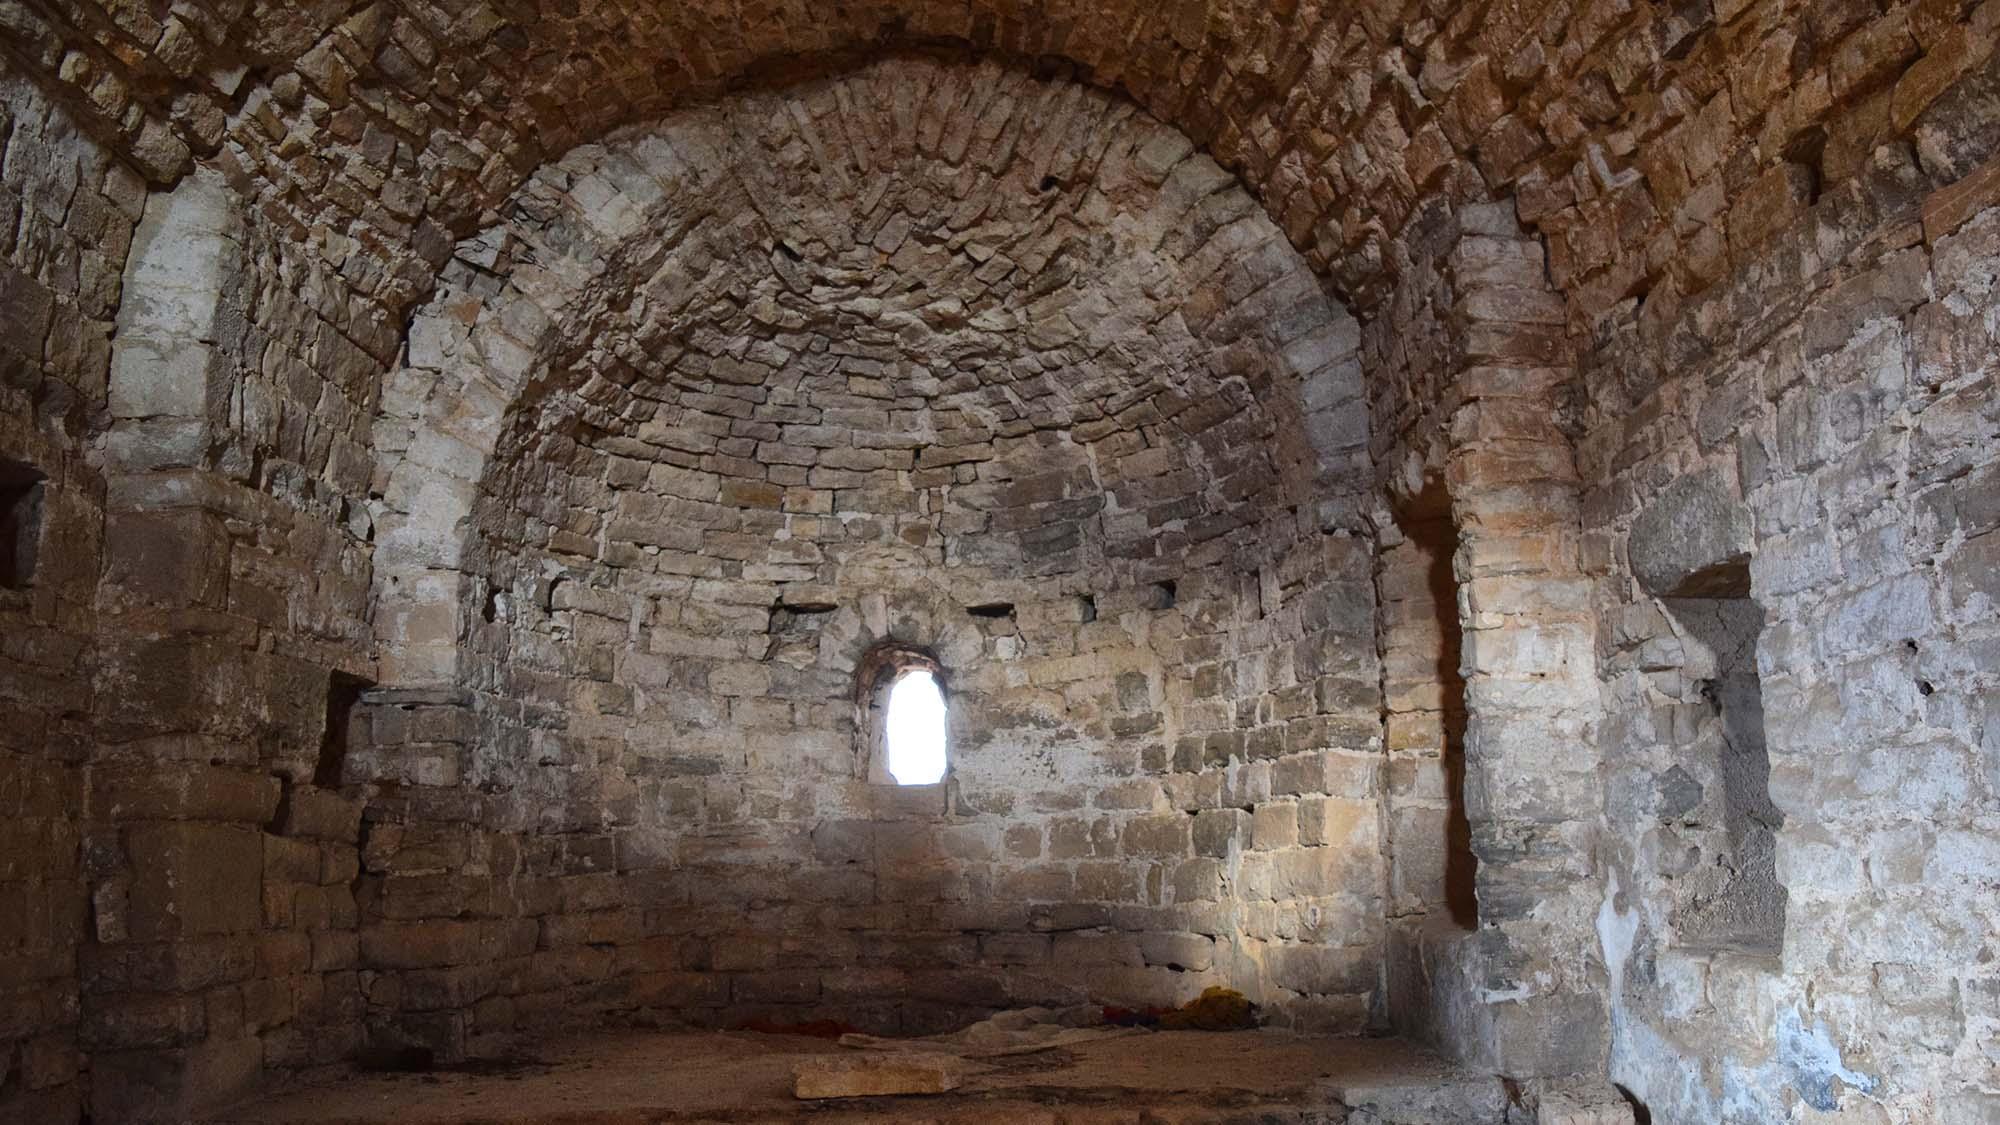 Capella de Santa Fe de Montfred